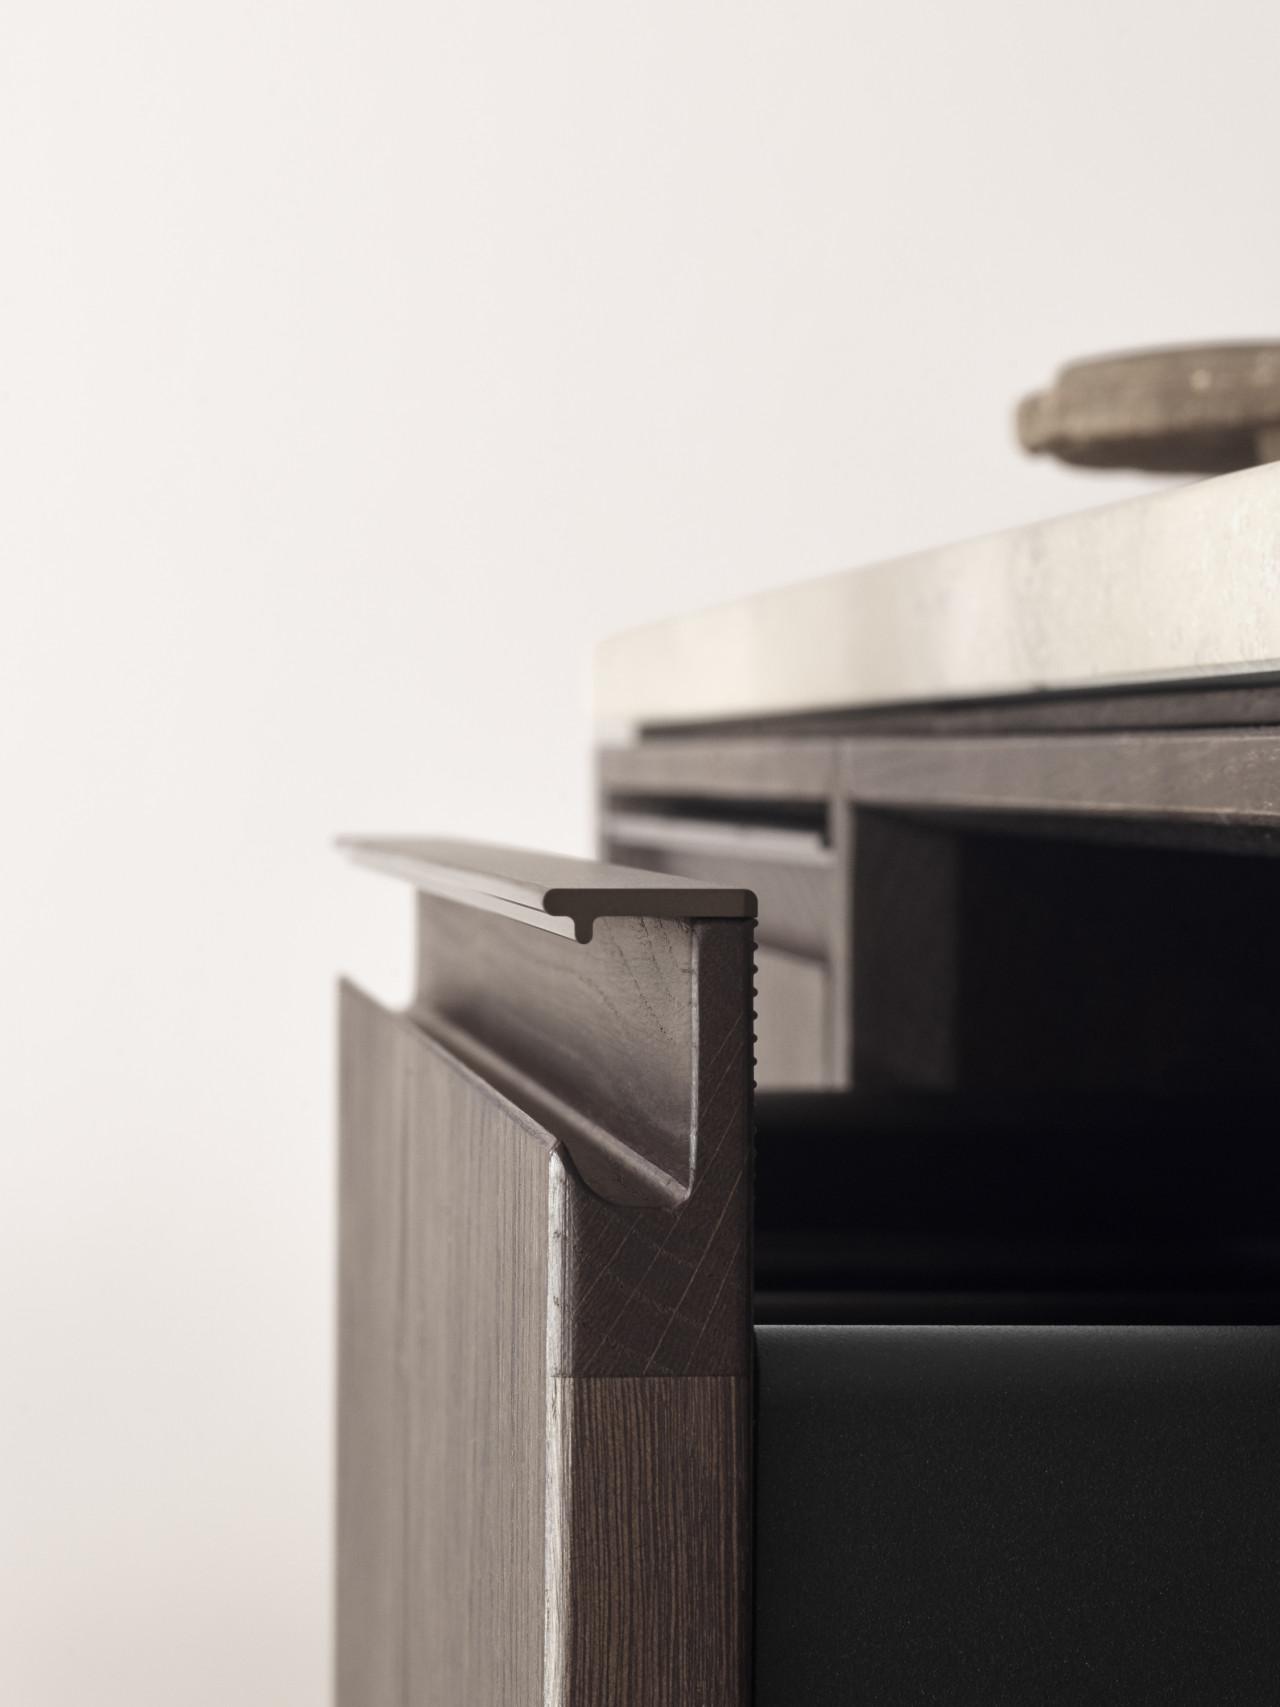 Vipp V2 extruded aluminum drawer grip